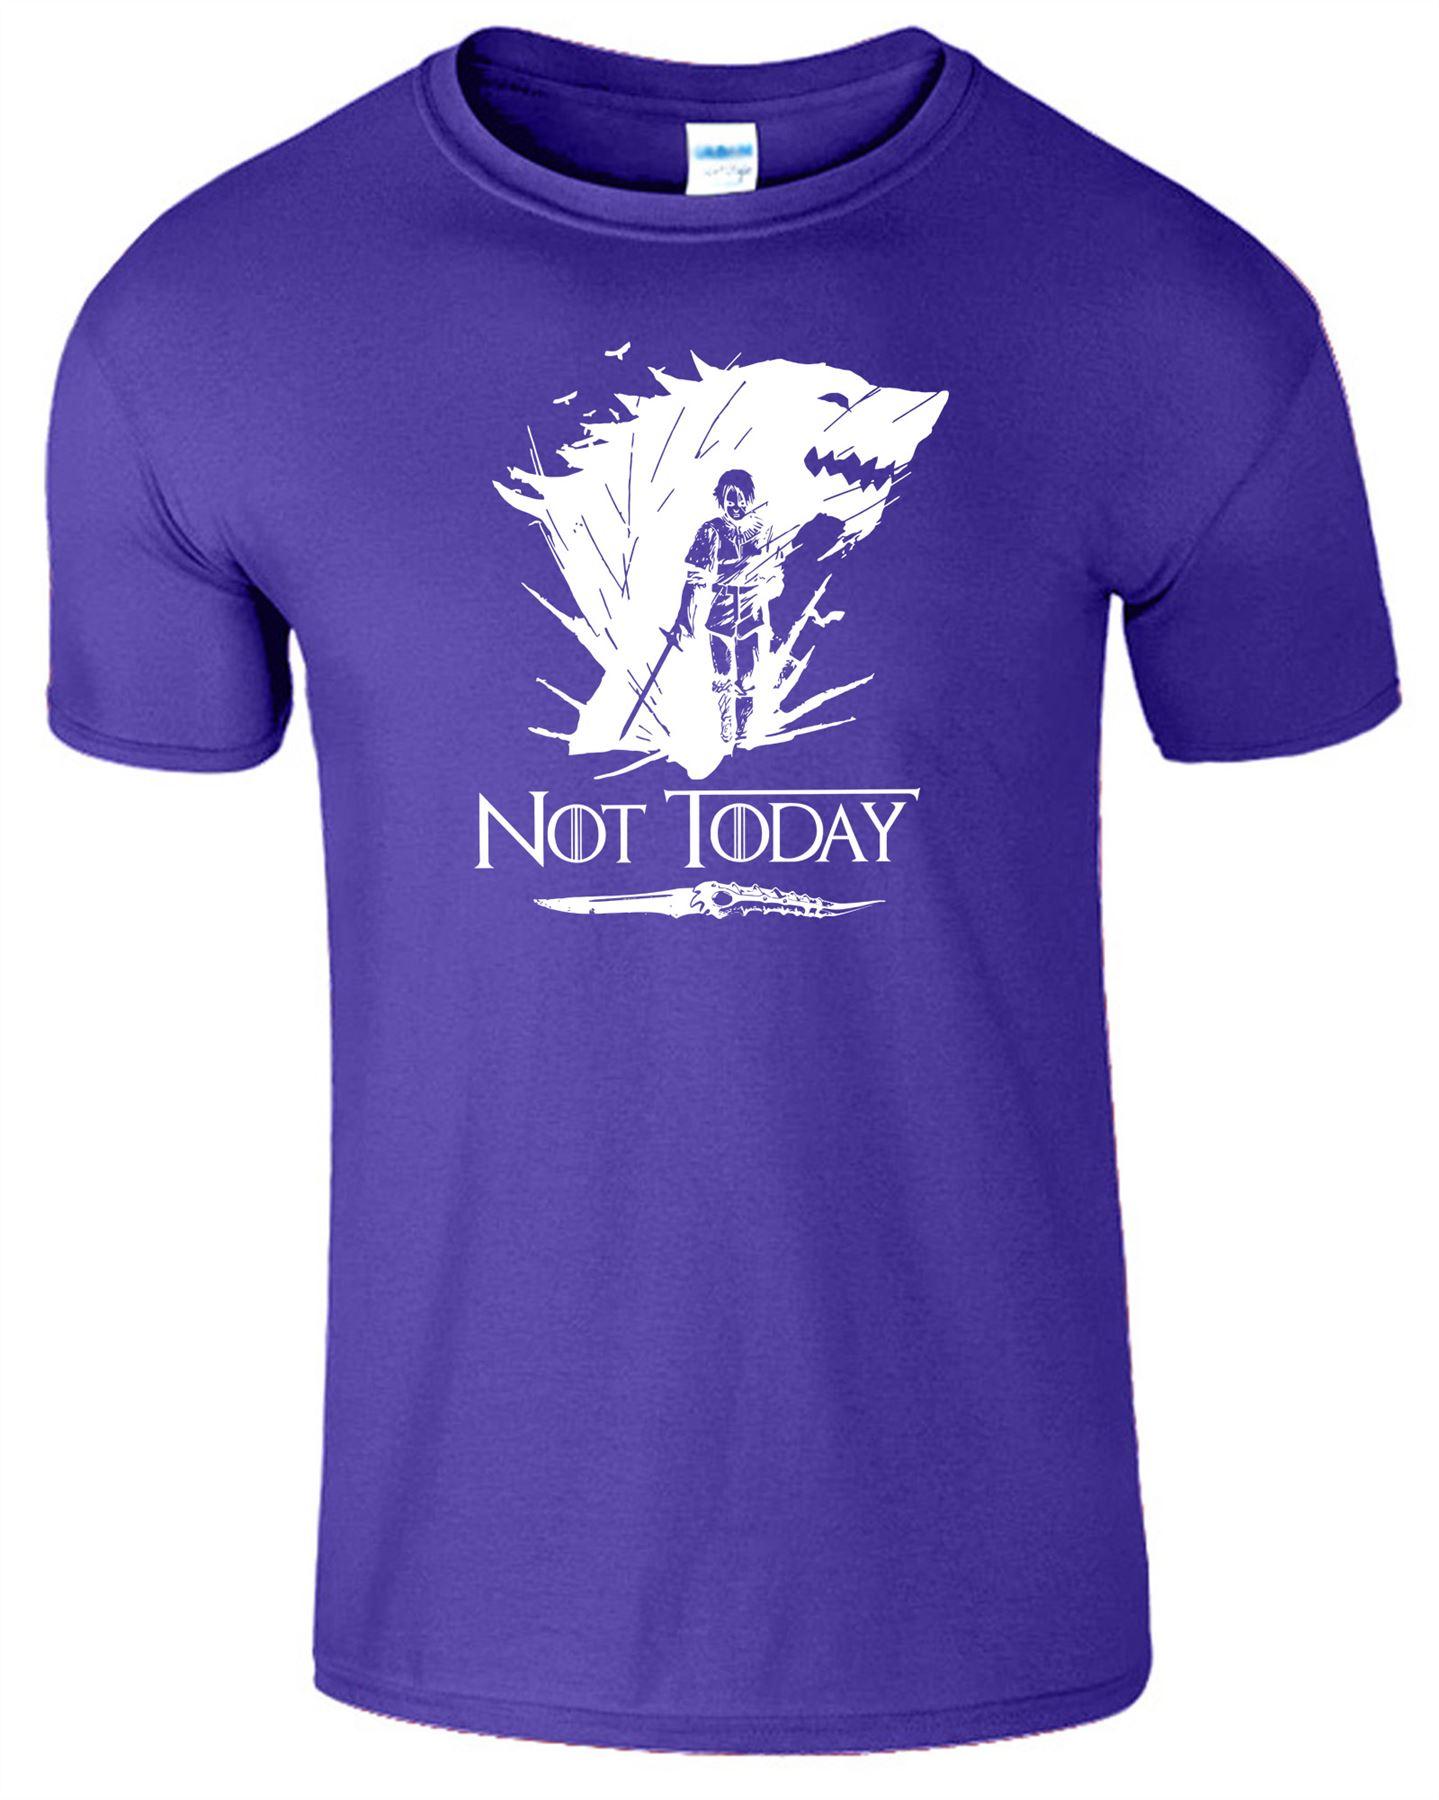 Arya-Stark-Not-Today-T-Shirt-Mens-Game-Season-Womens-Shirt-Adults-Unisex-Fit Indexbild 9